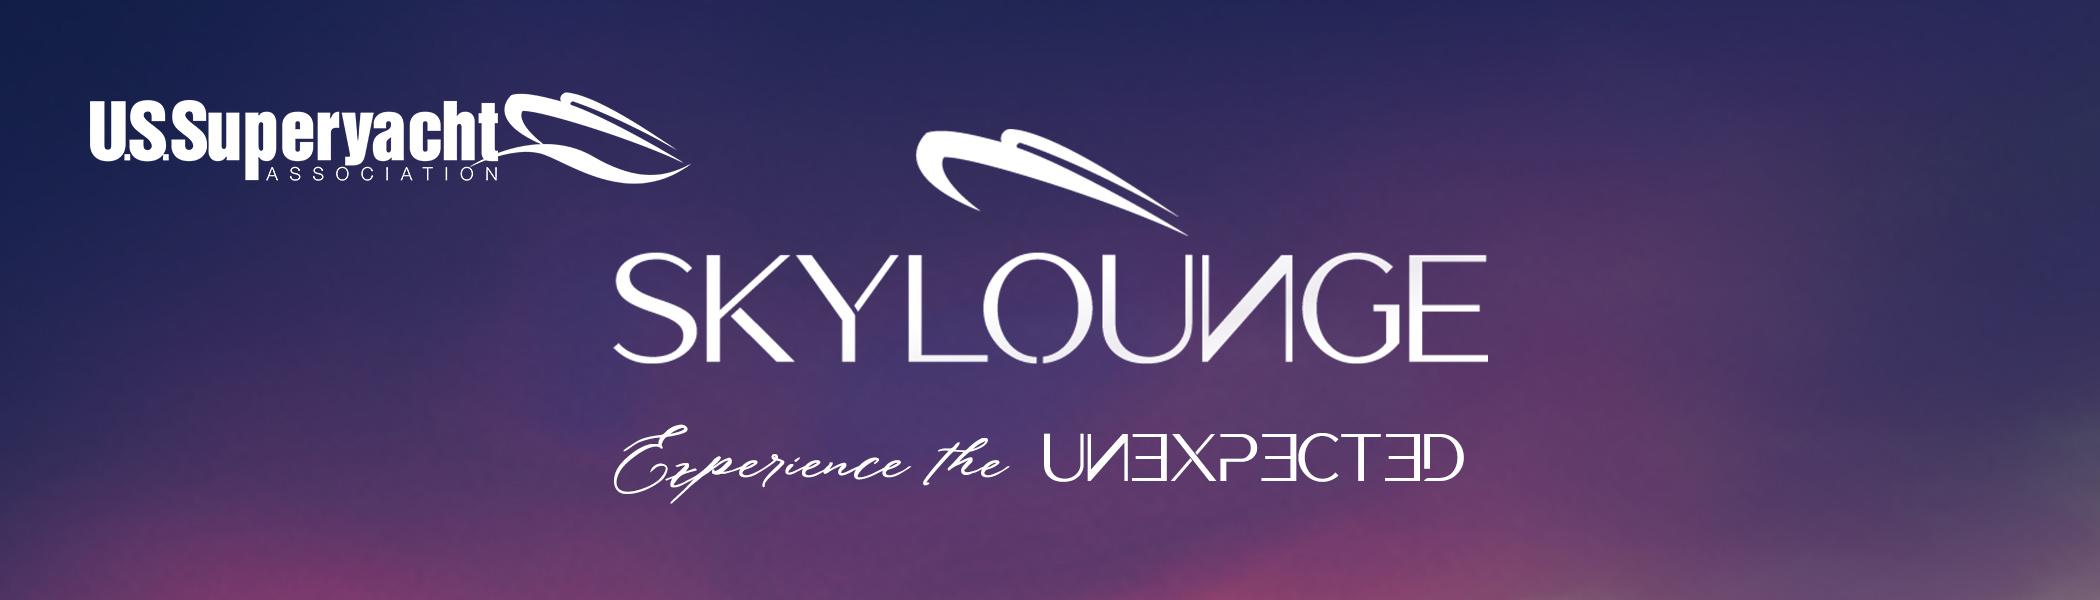 Header with skylounge logo